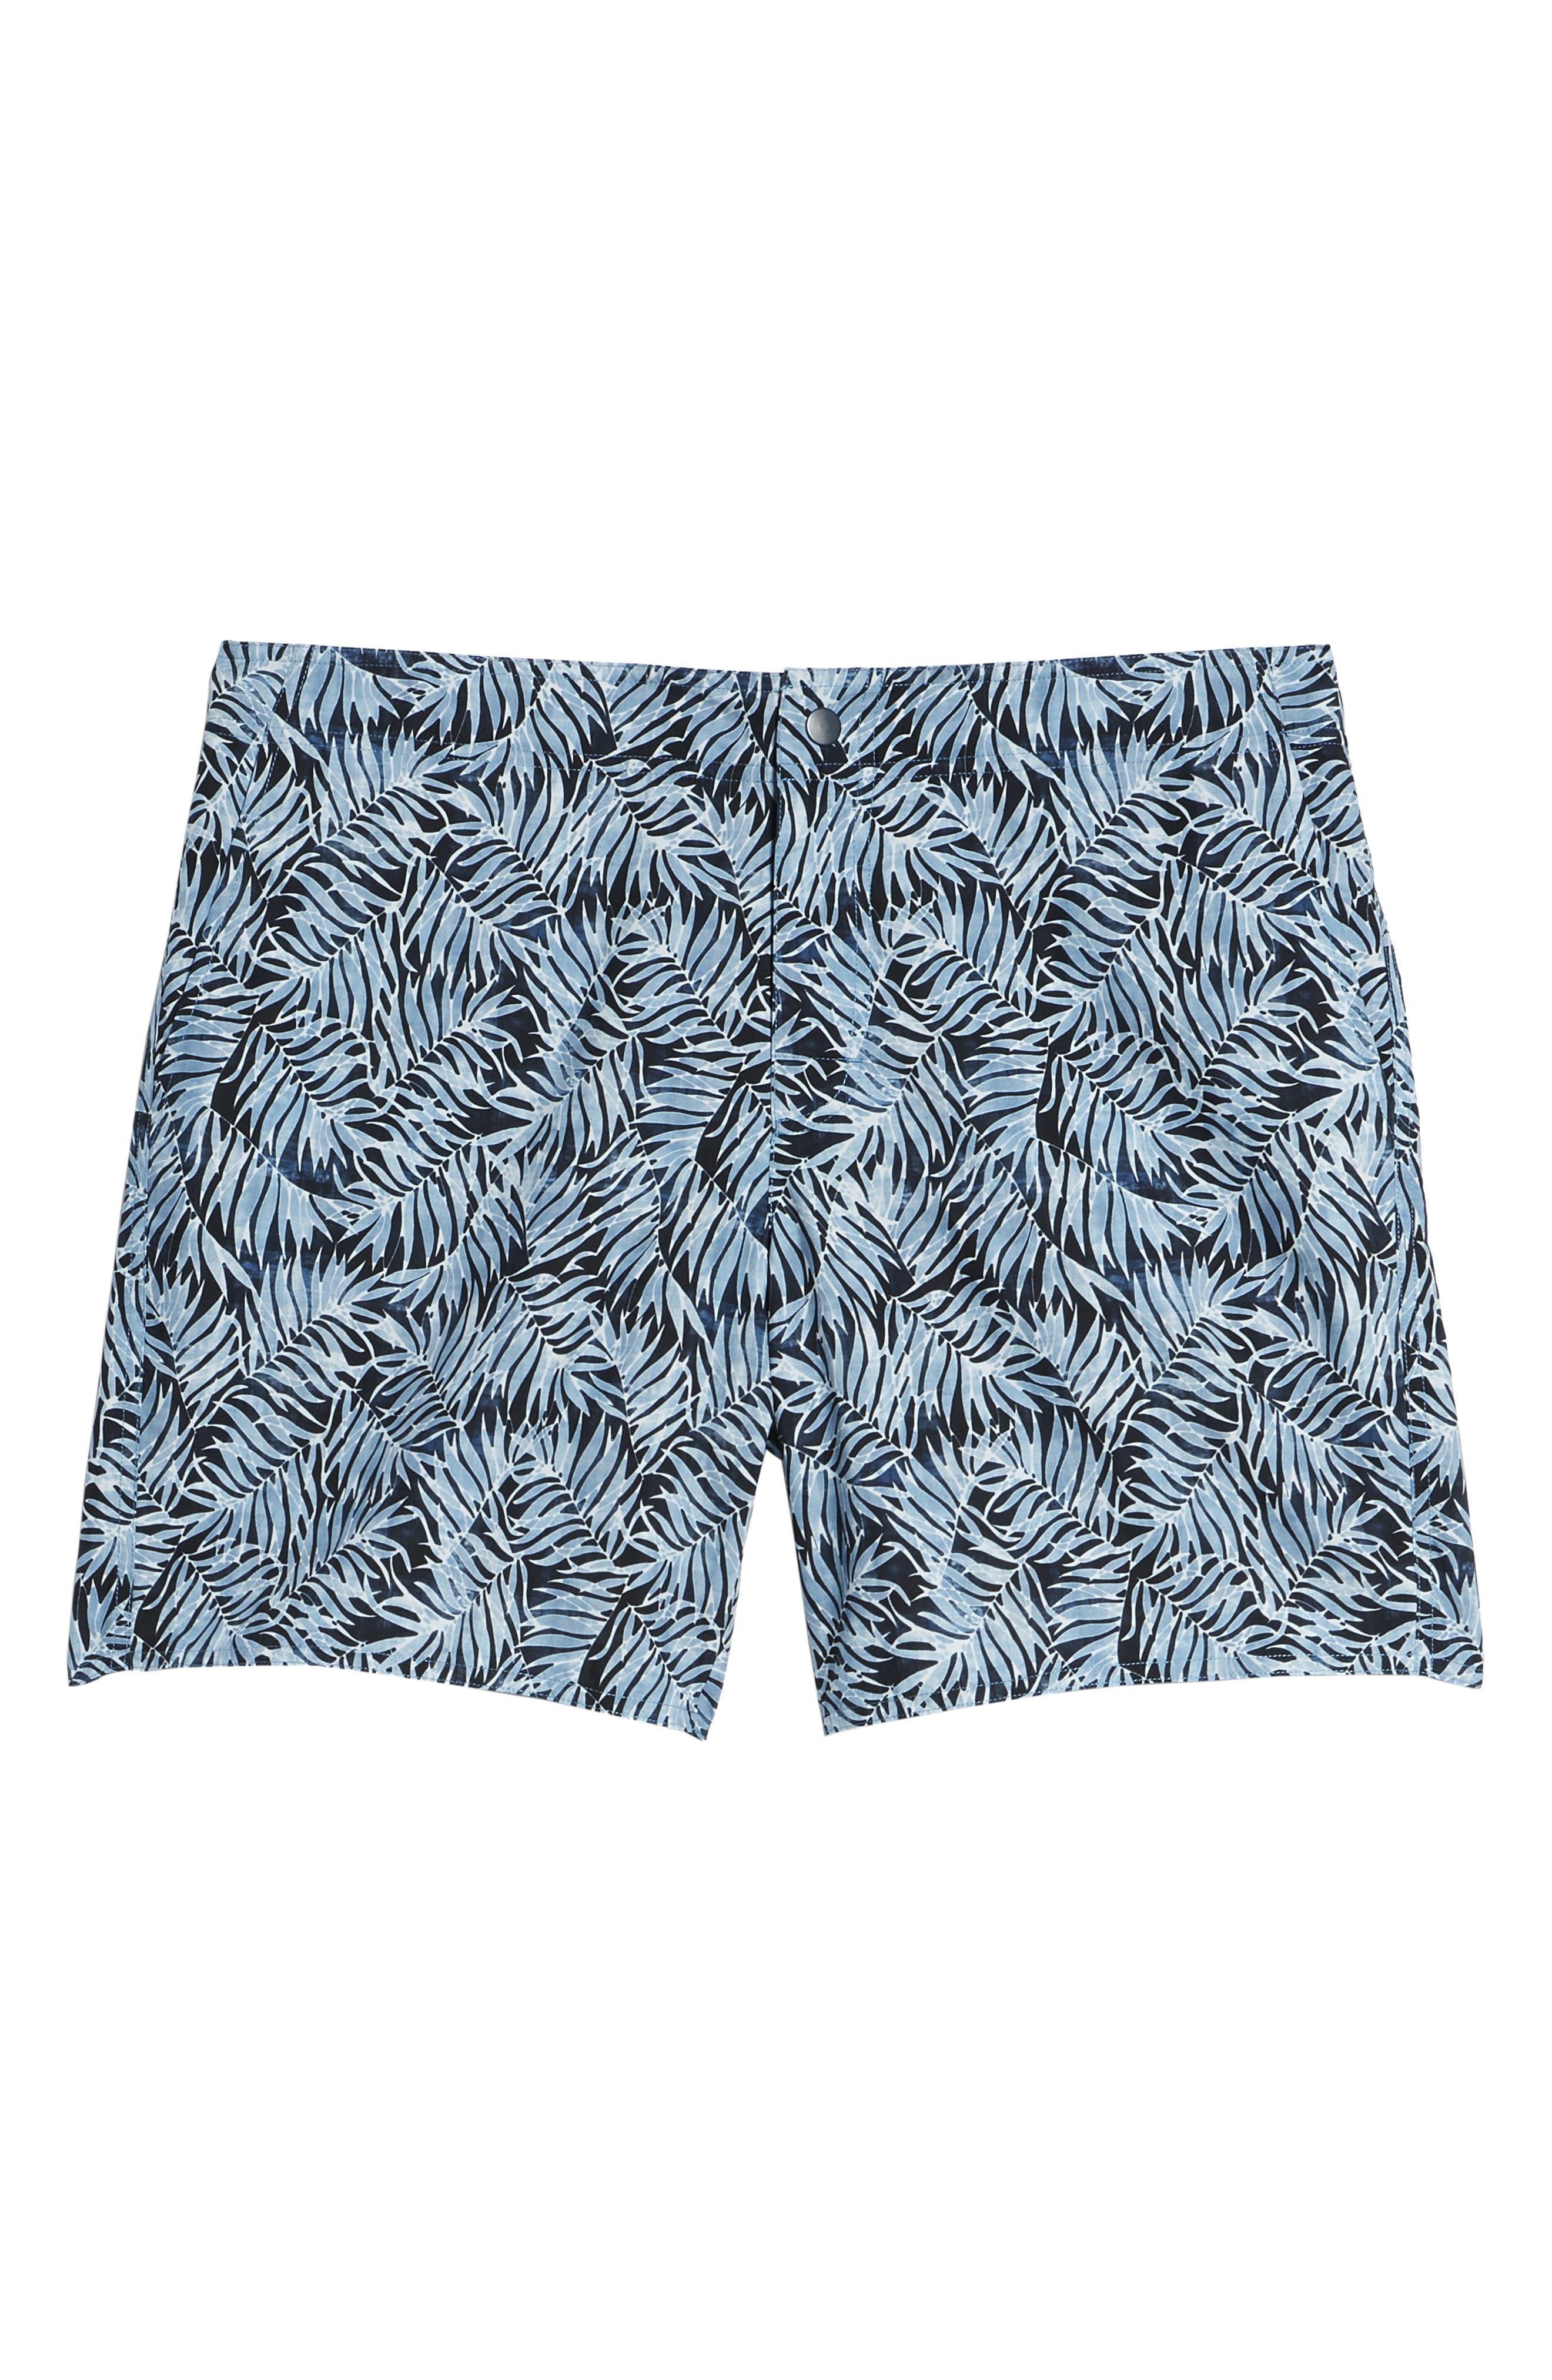 Avondale Palm Print Swim Trunks,                             Alternate thumbnail 6, color,                             Blue